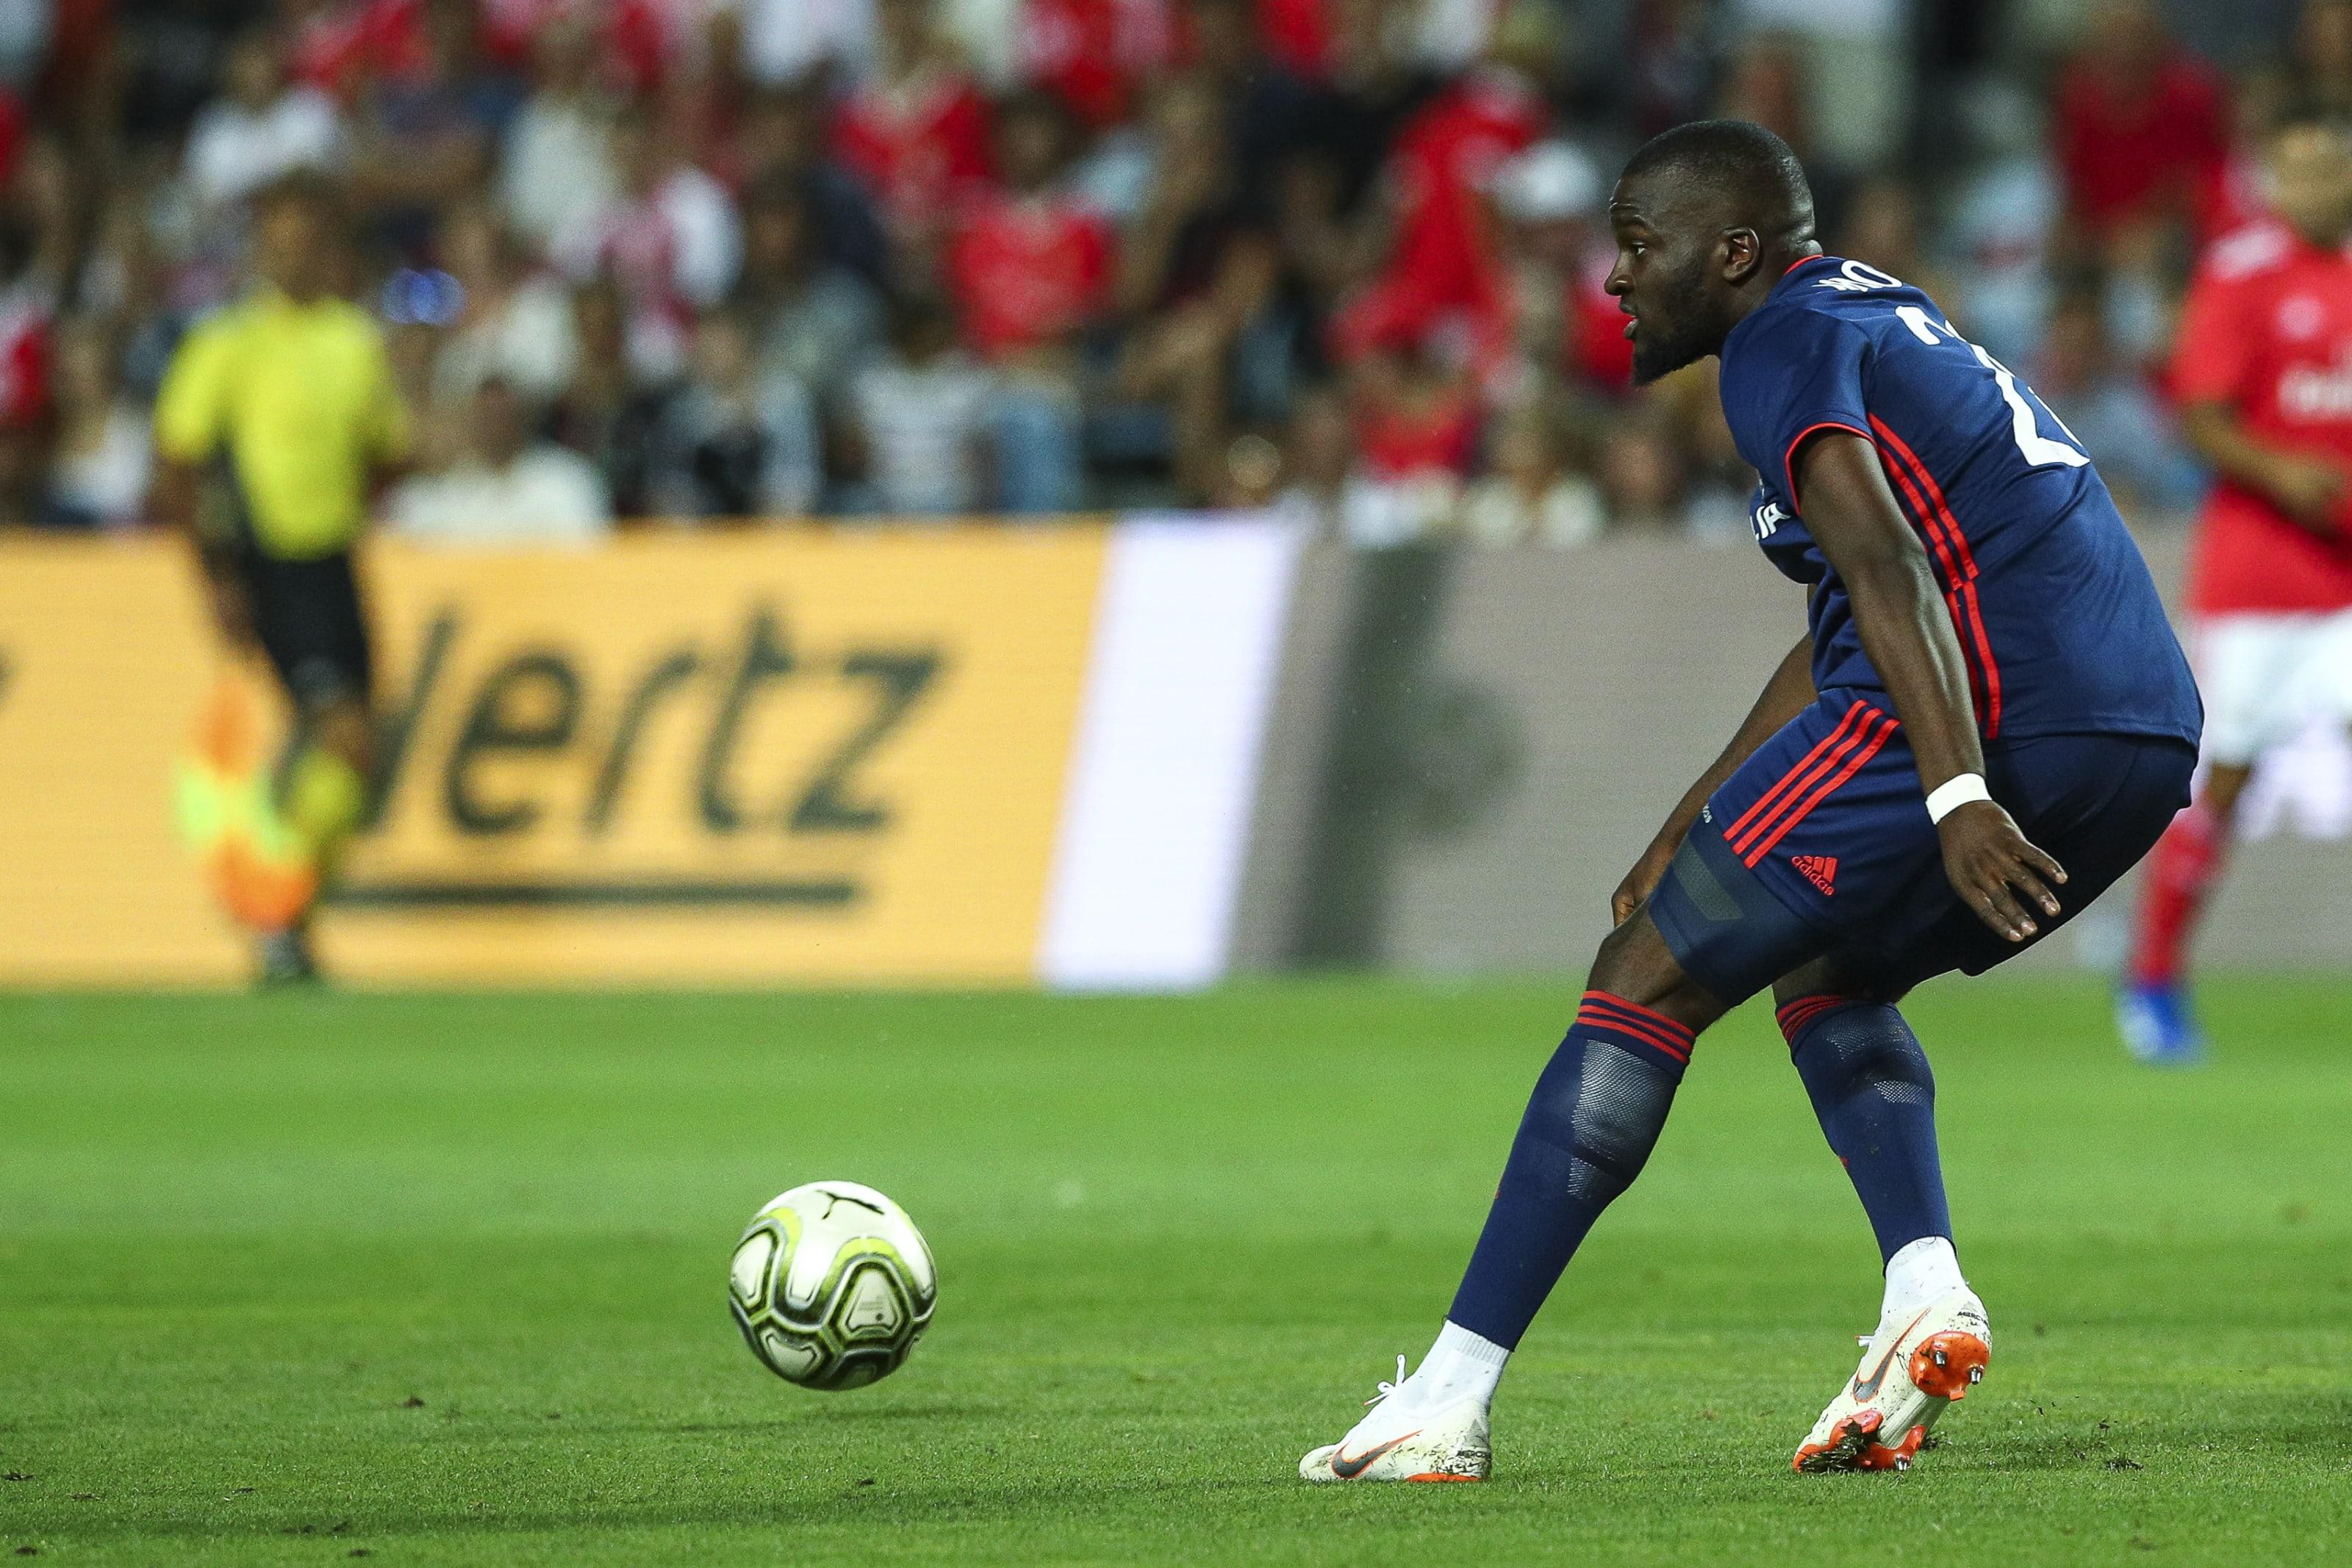 Tottenham's chances of signing Lyon's Tanguy Ndombele are increasing